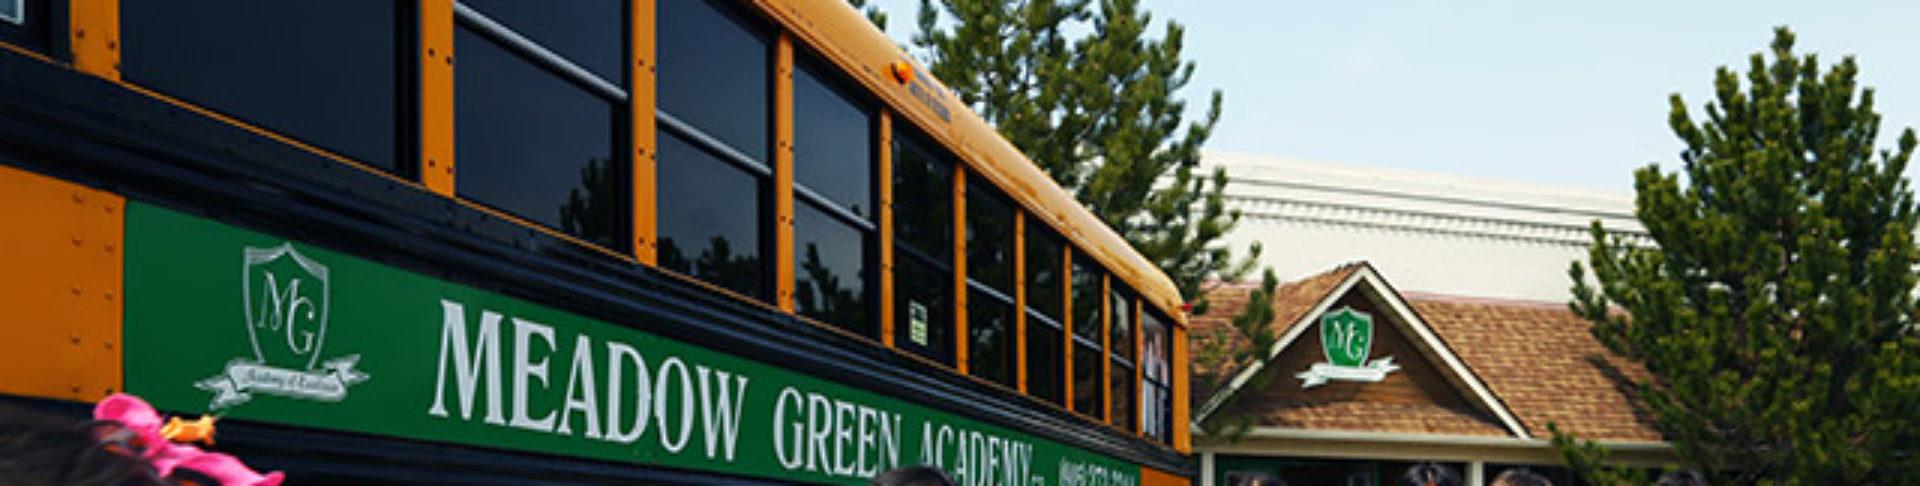 Meadow Green Academy